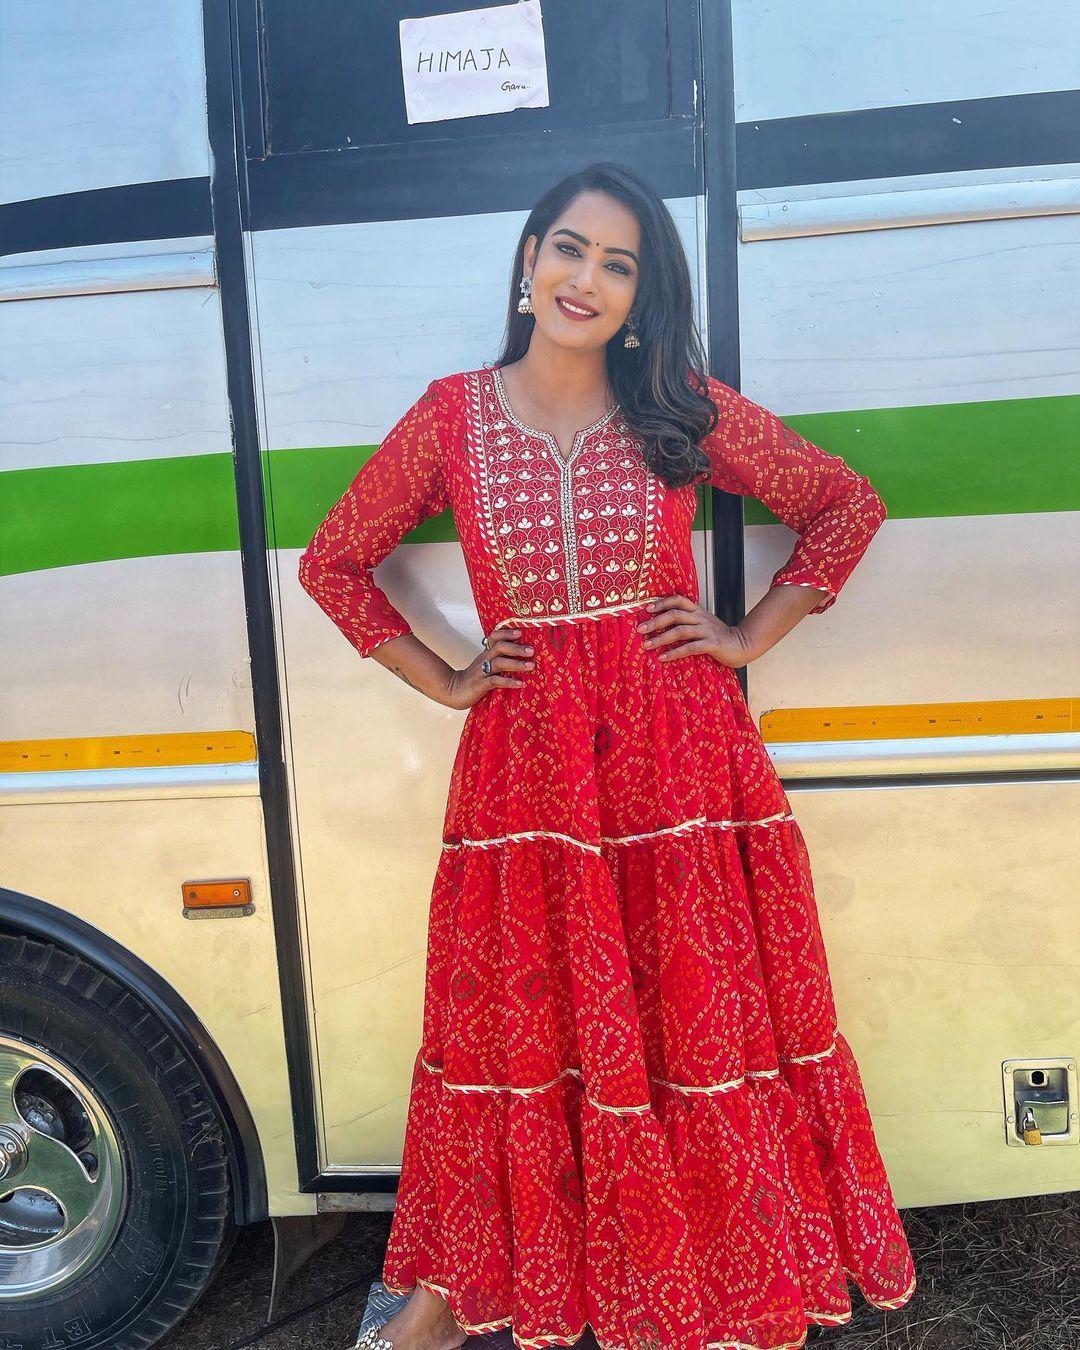 Beautiful actress Himaja in floor length bandhini dress with mirror work. 2021-04-20